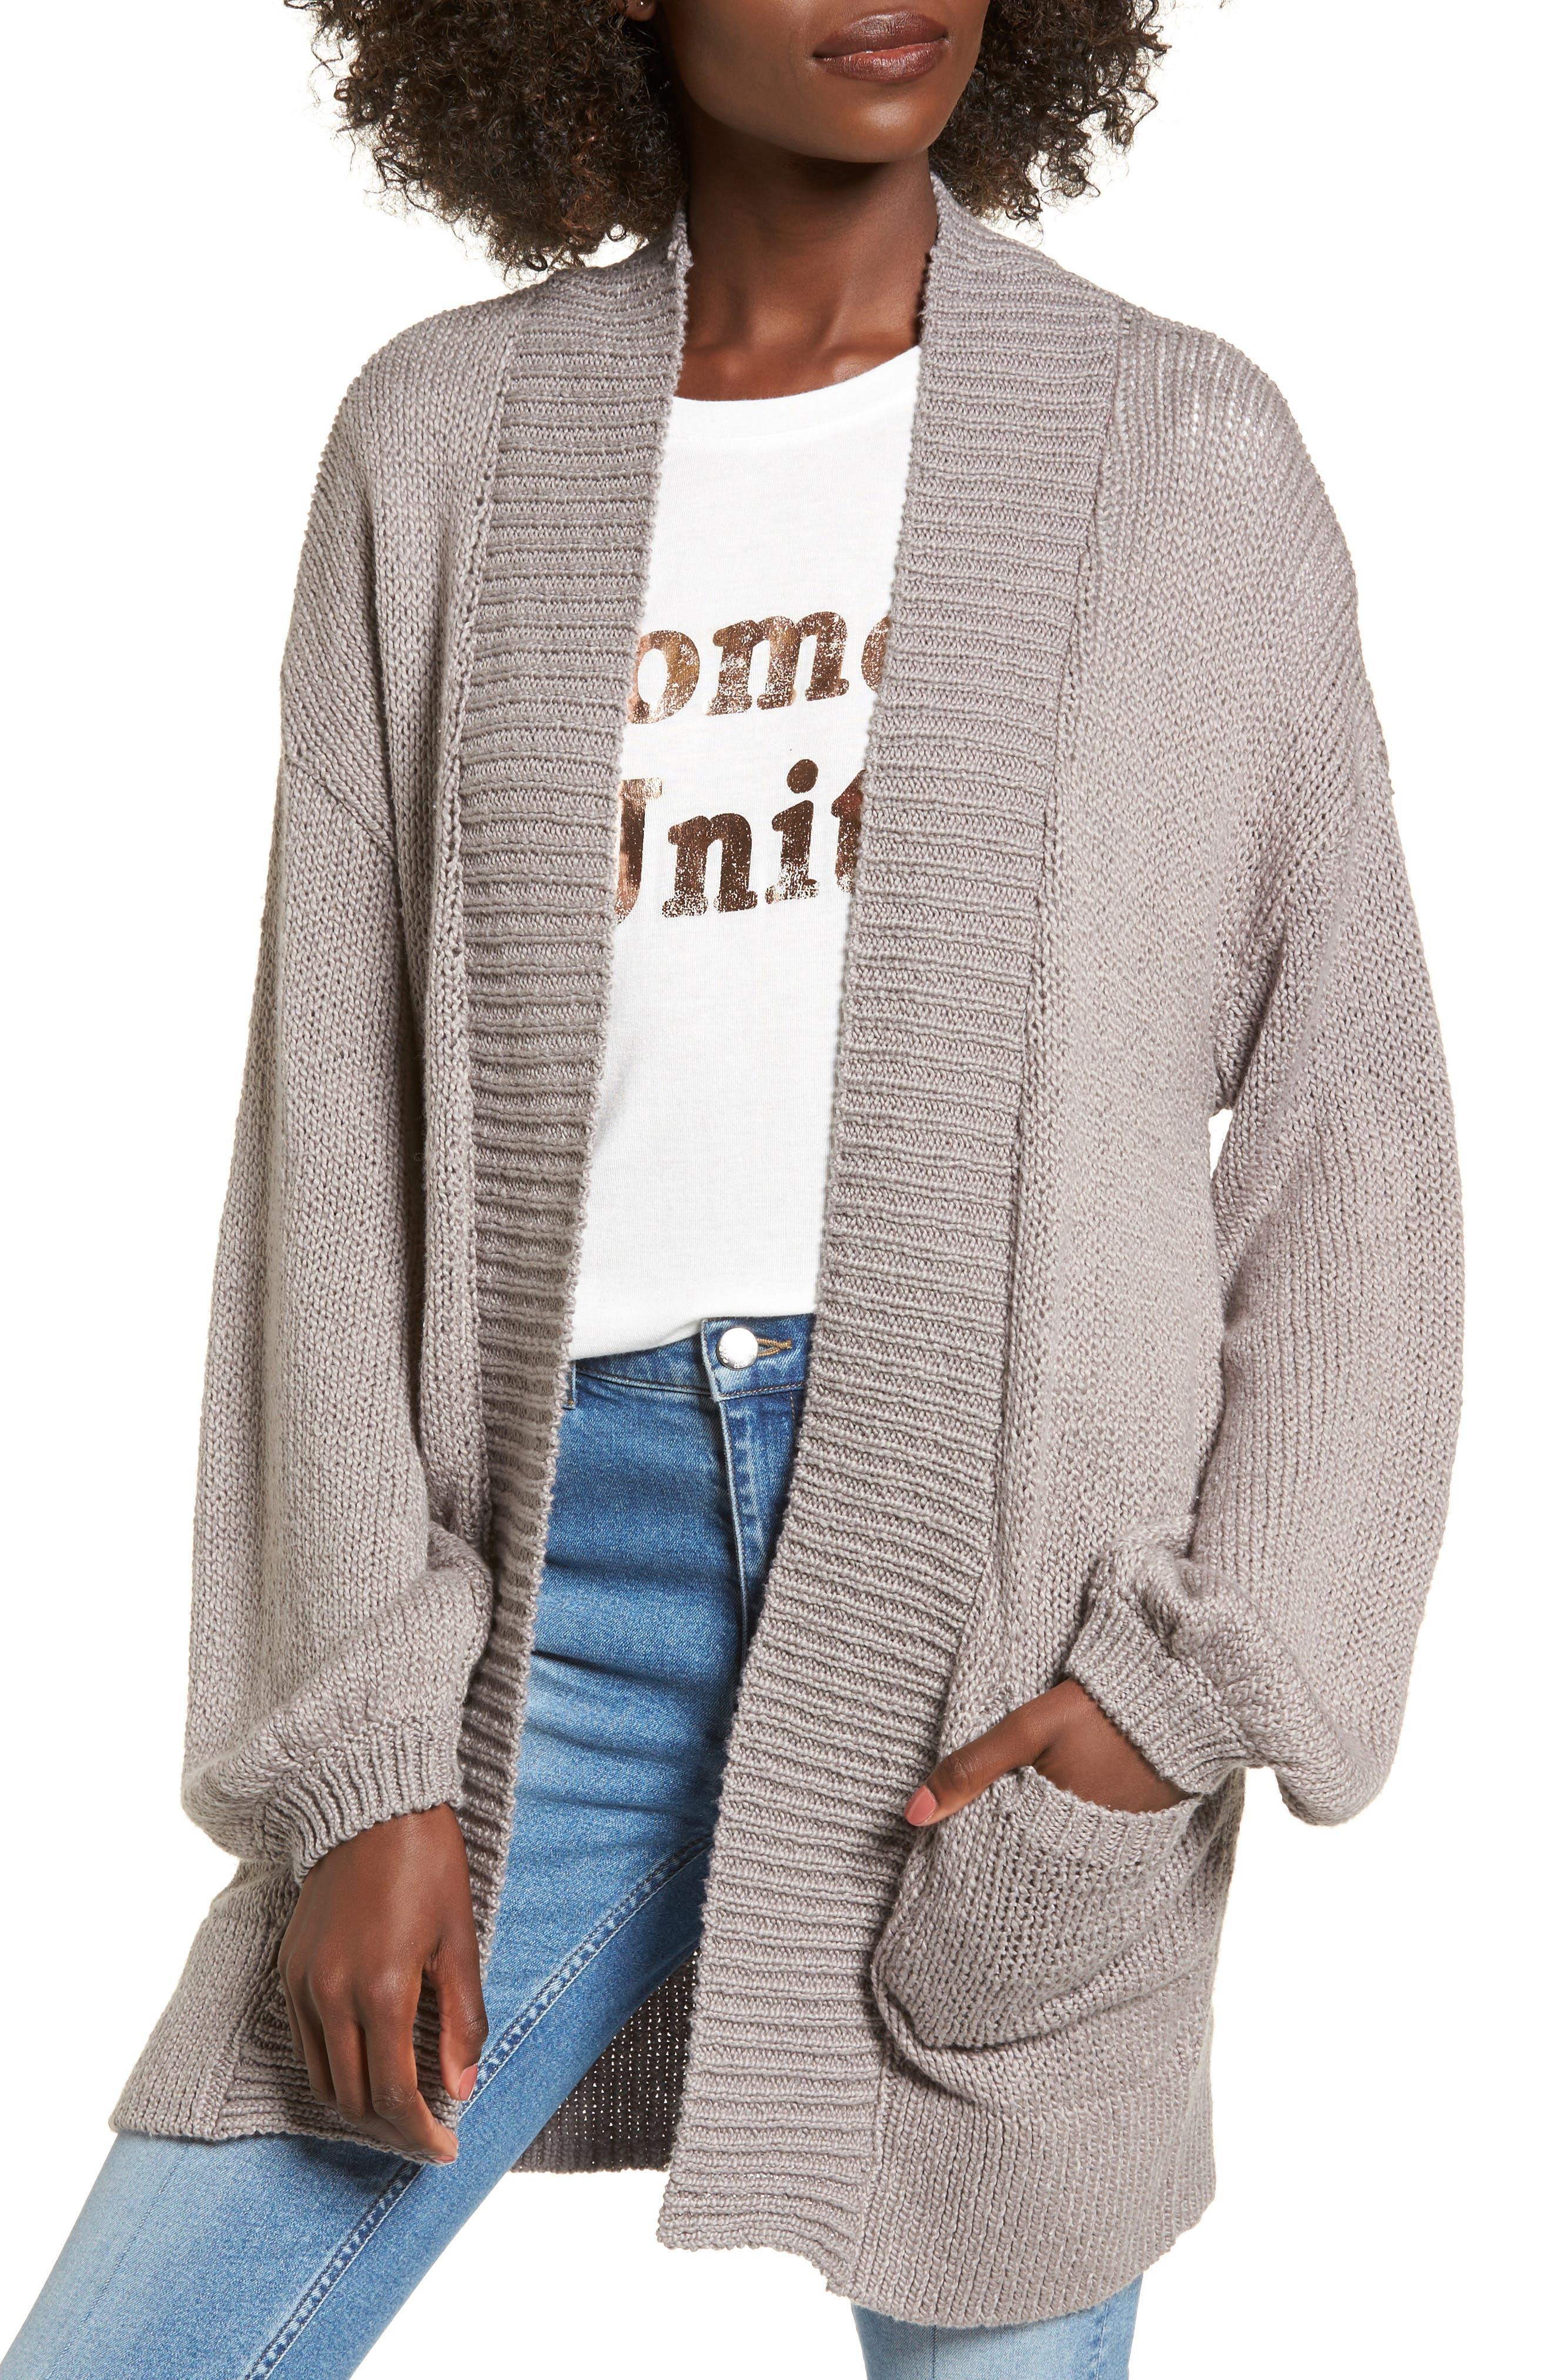 Blouson Sleeve Knit Cardigan,                             Main thumbnail 1, color,                             030